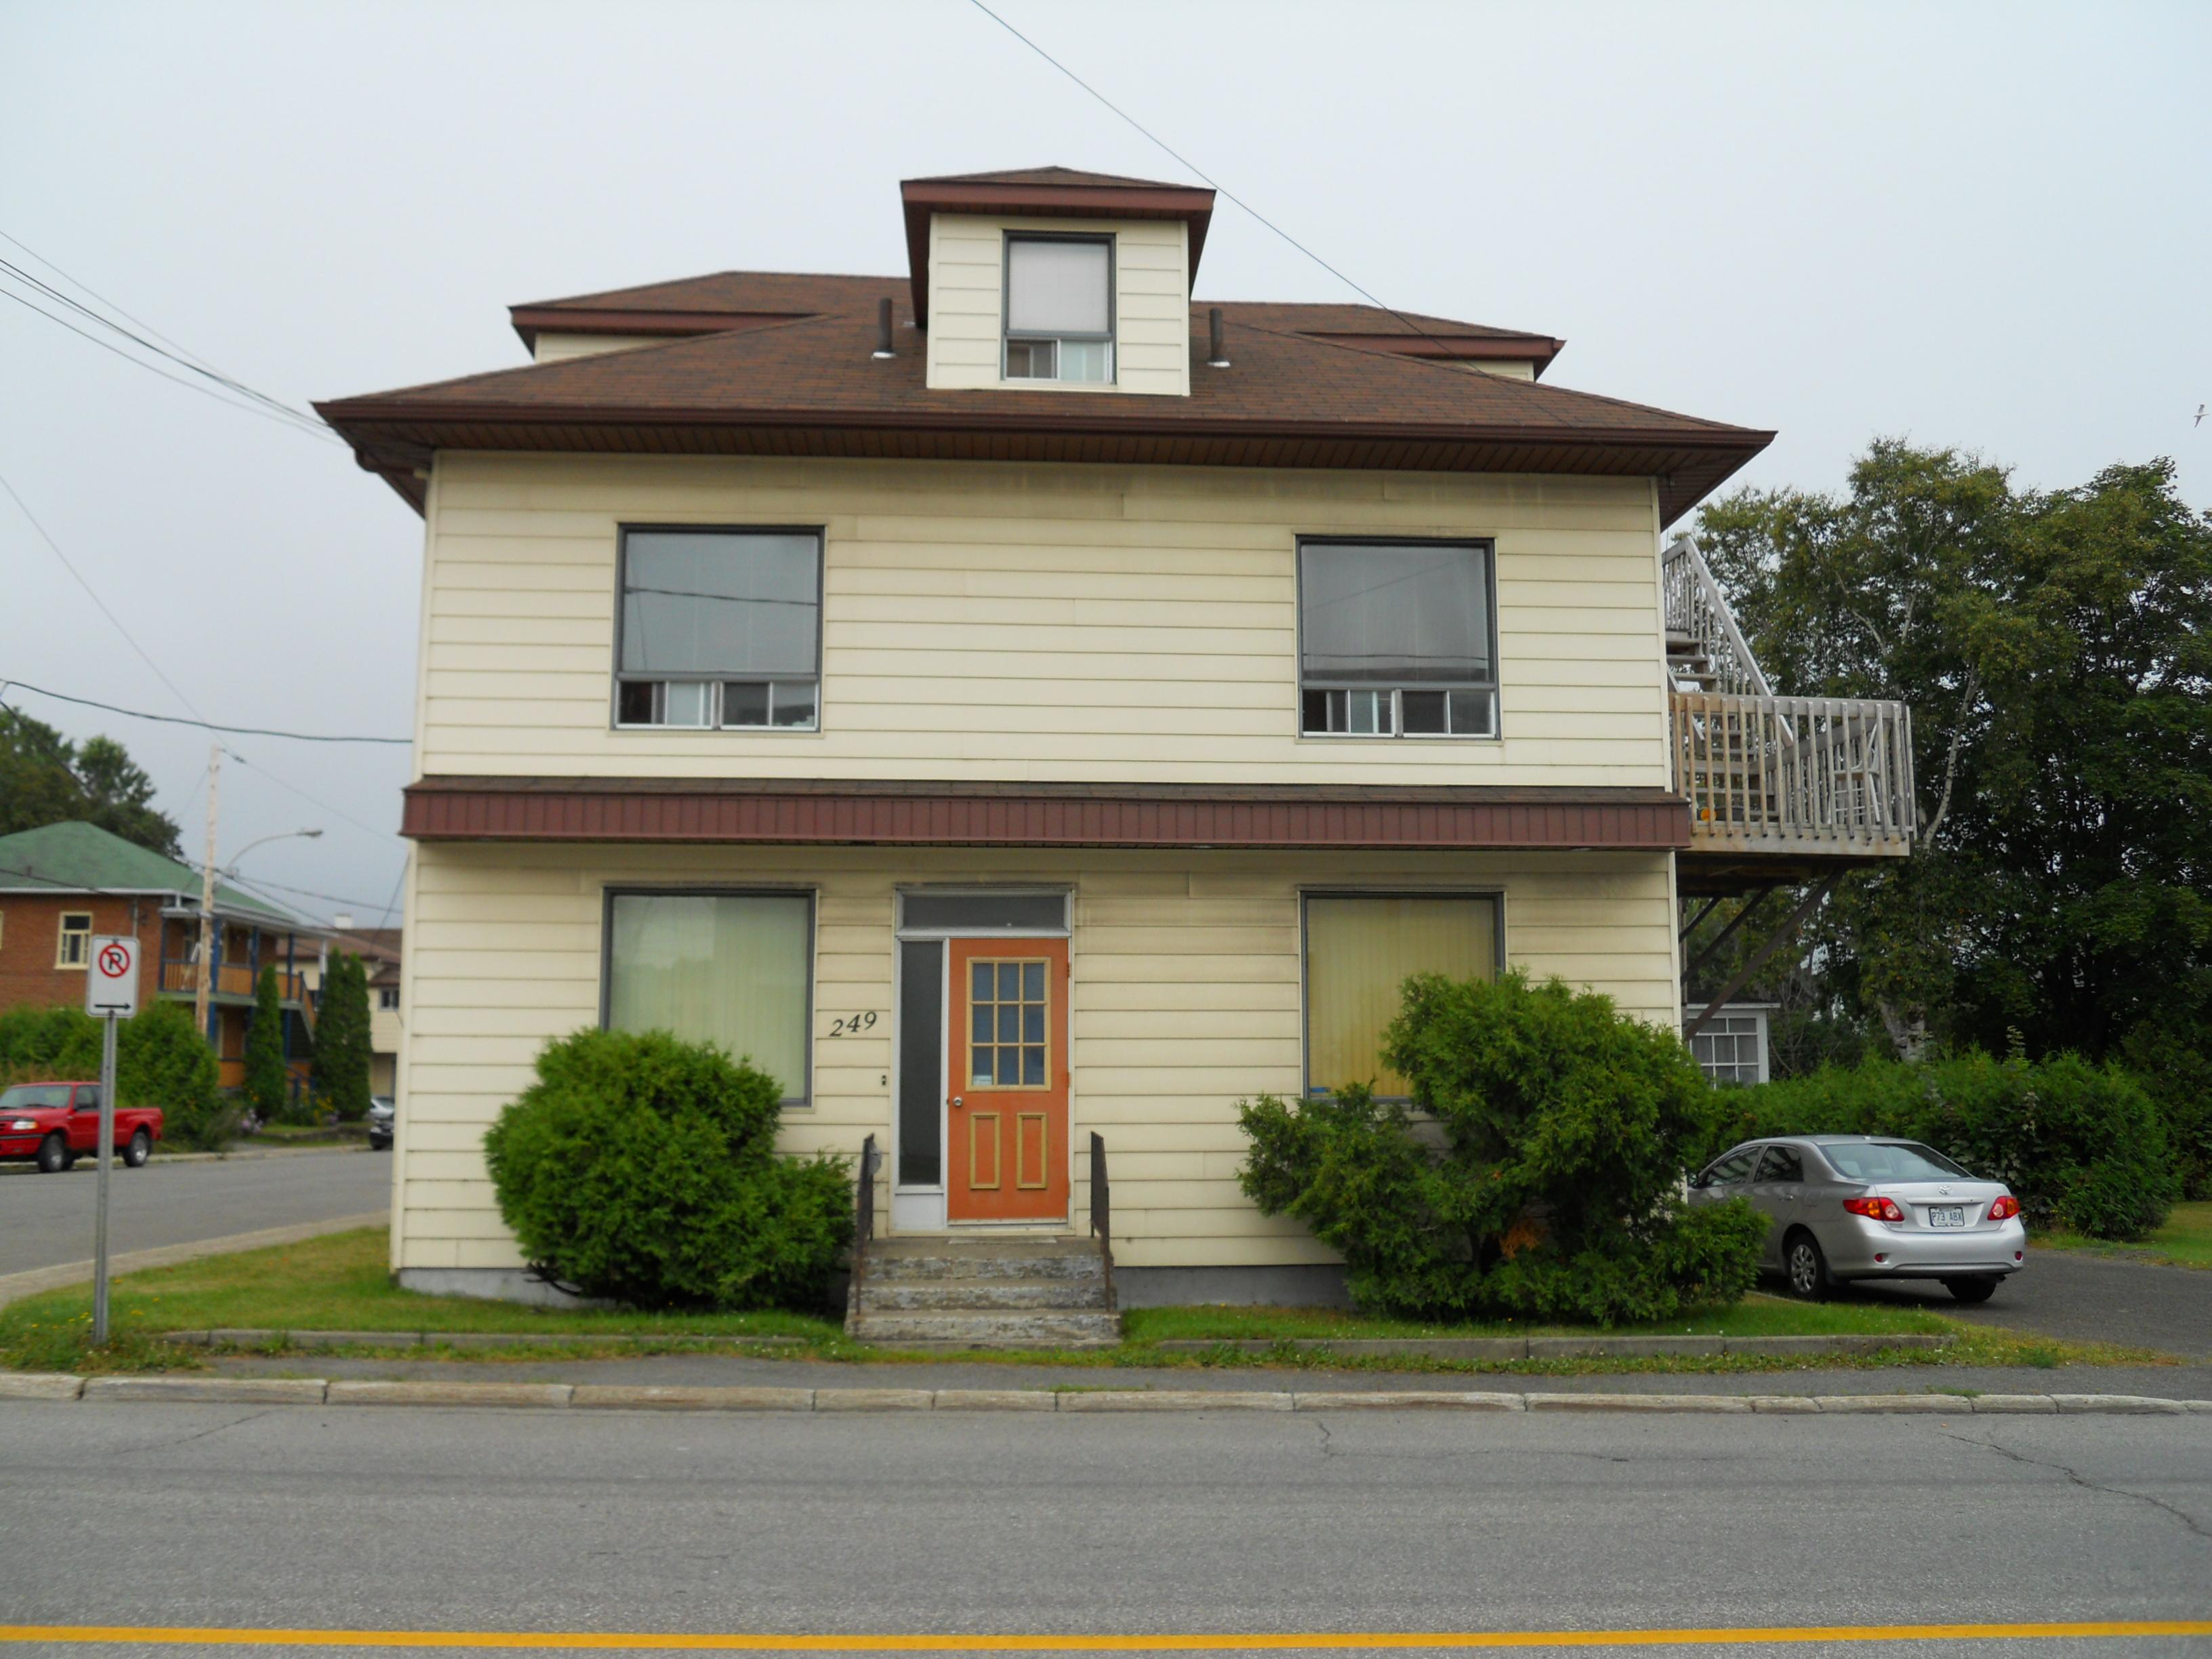 1220 - 249, avenue Rouleau